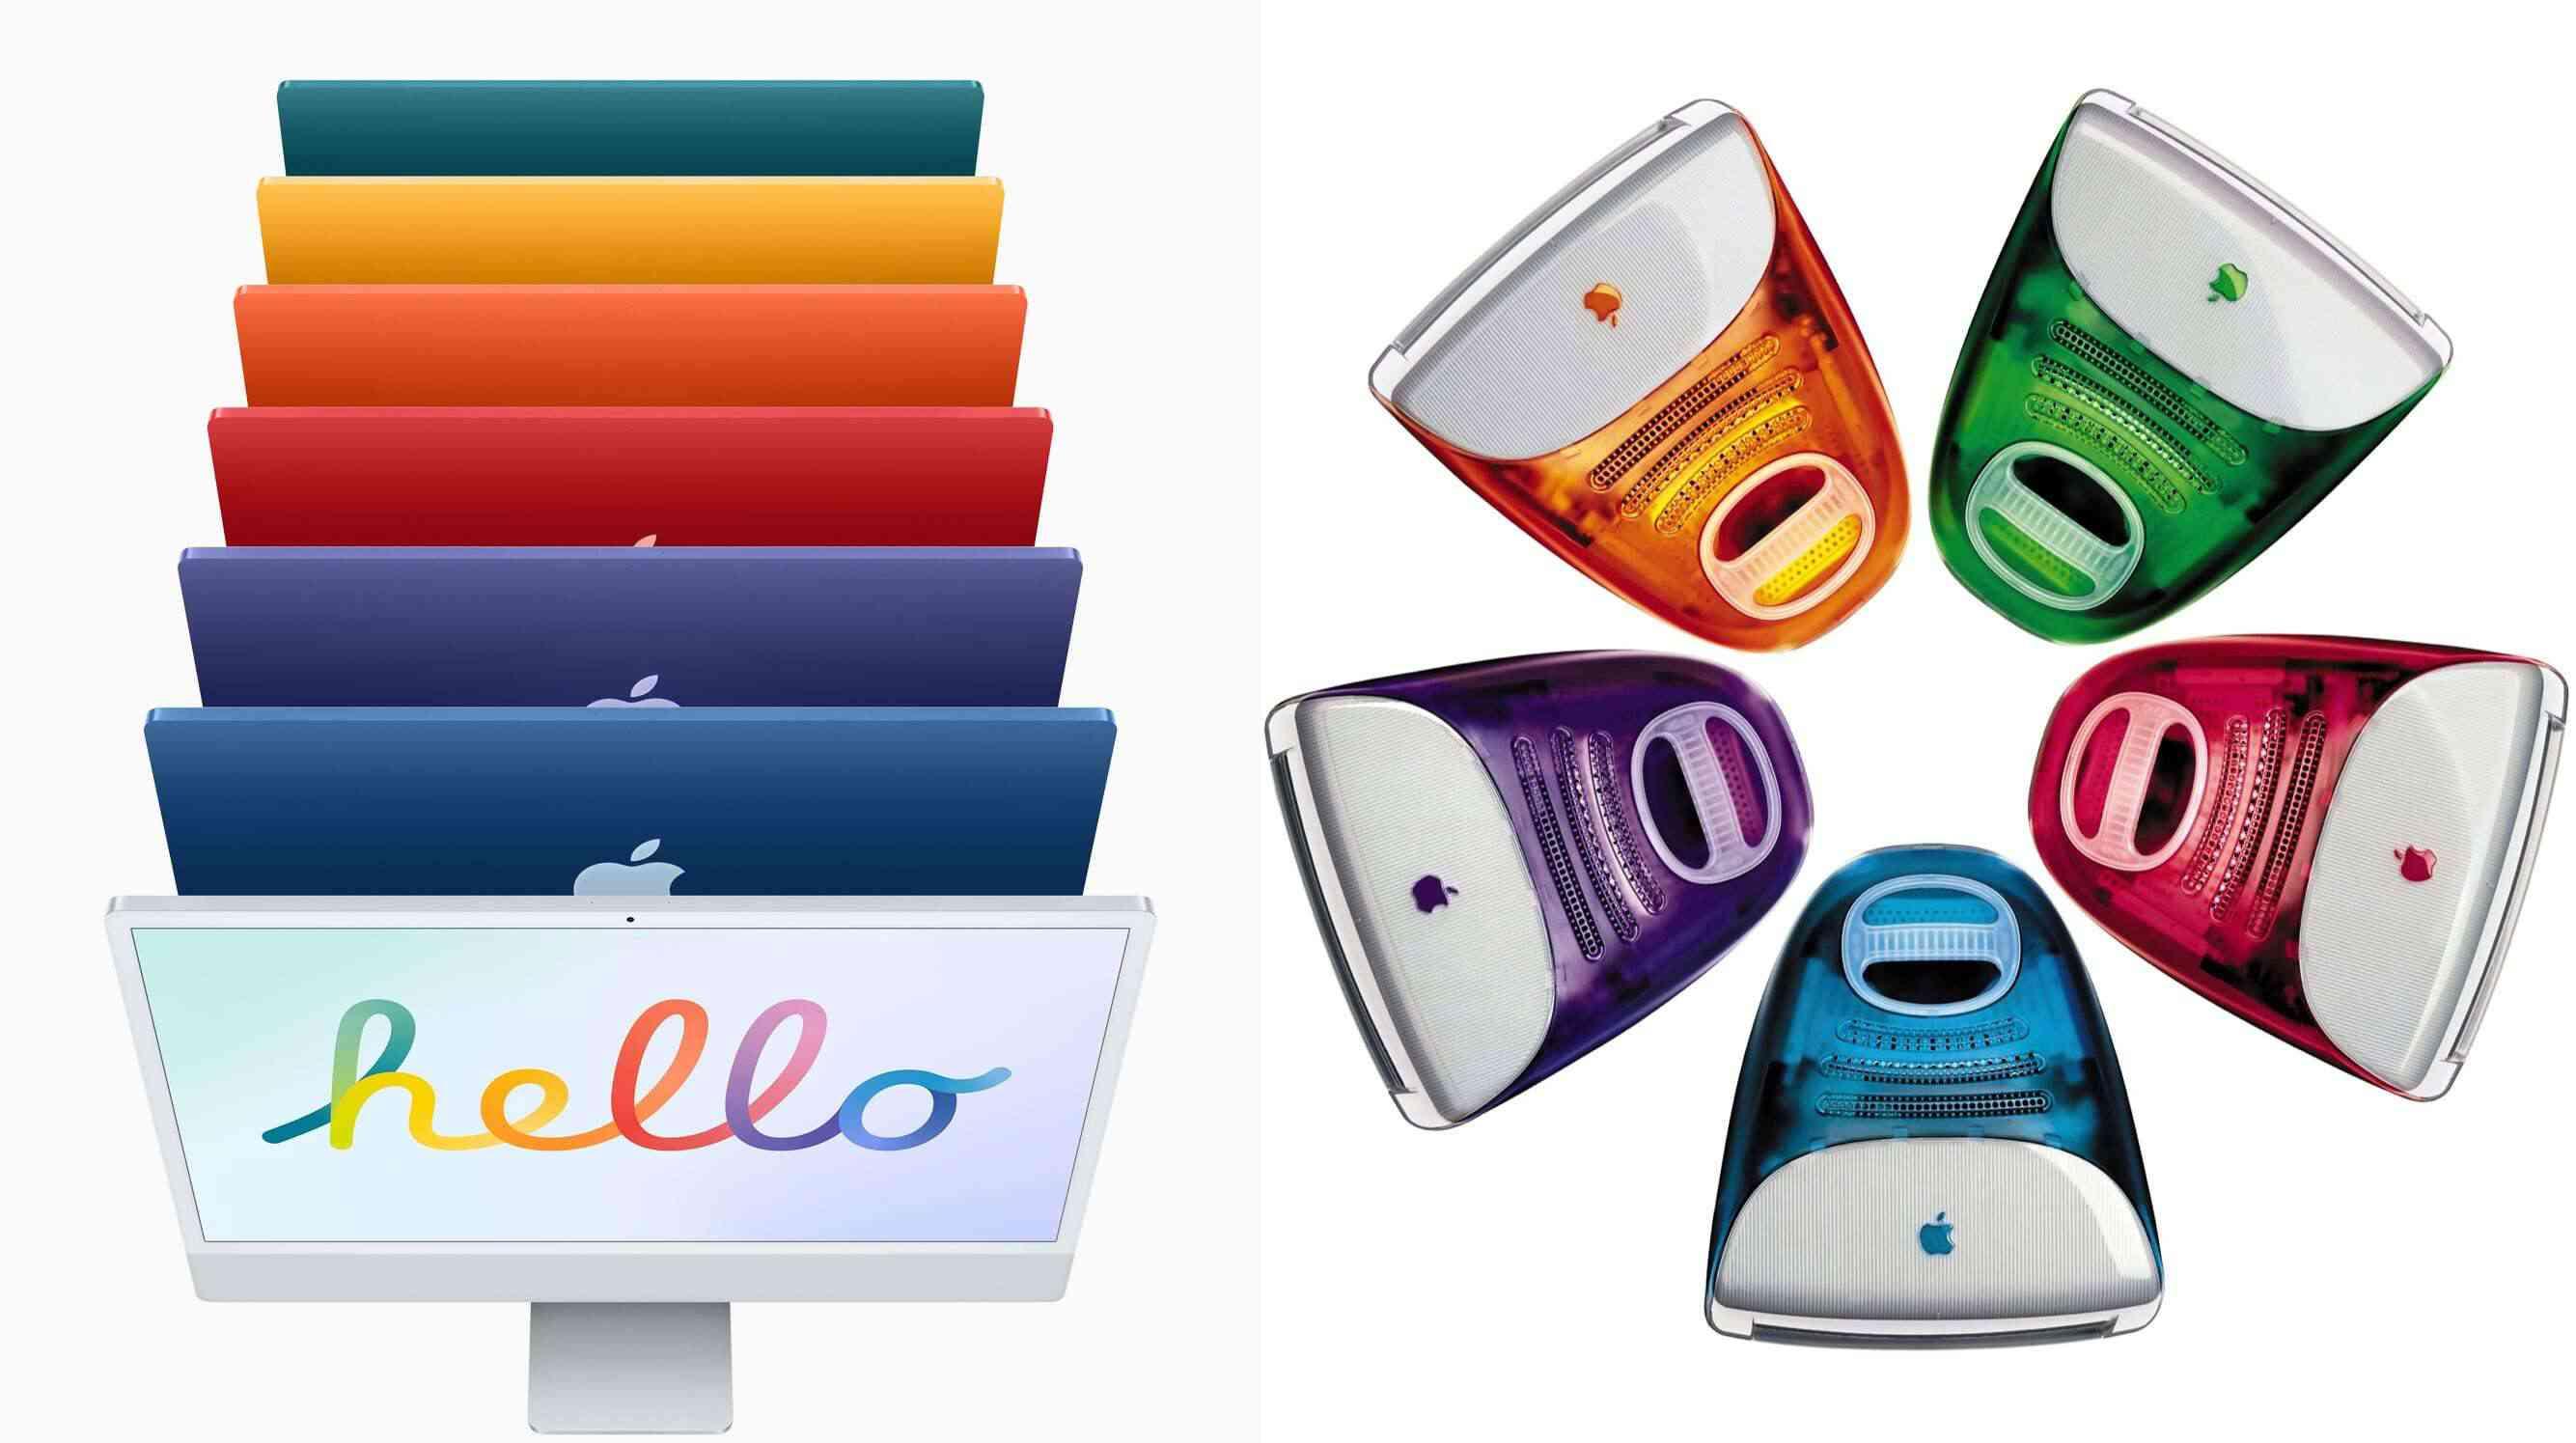 New M1 iMac next to older iMacs on a white background